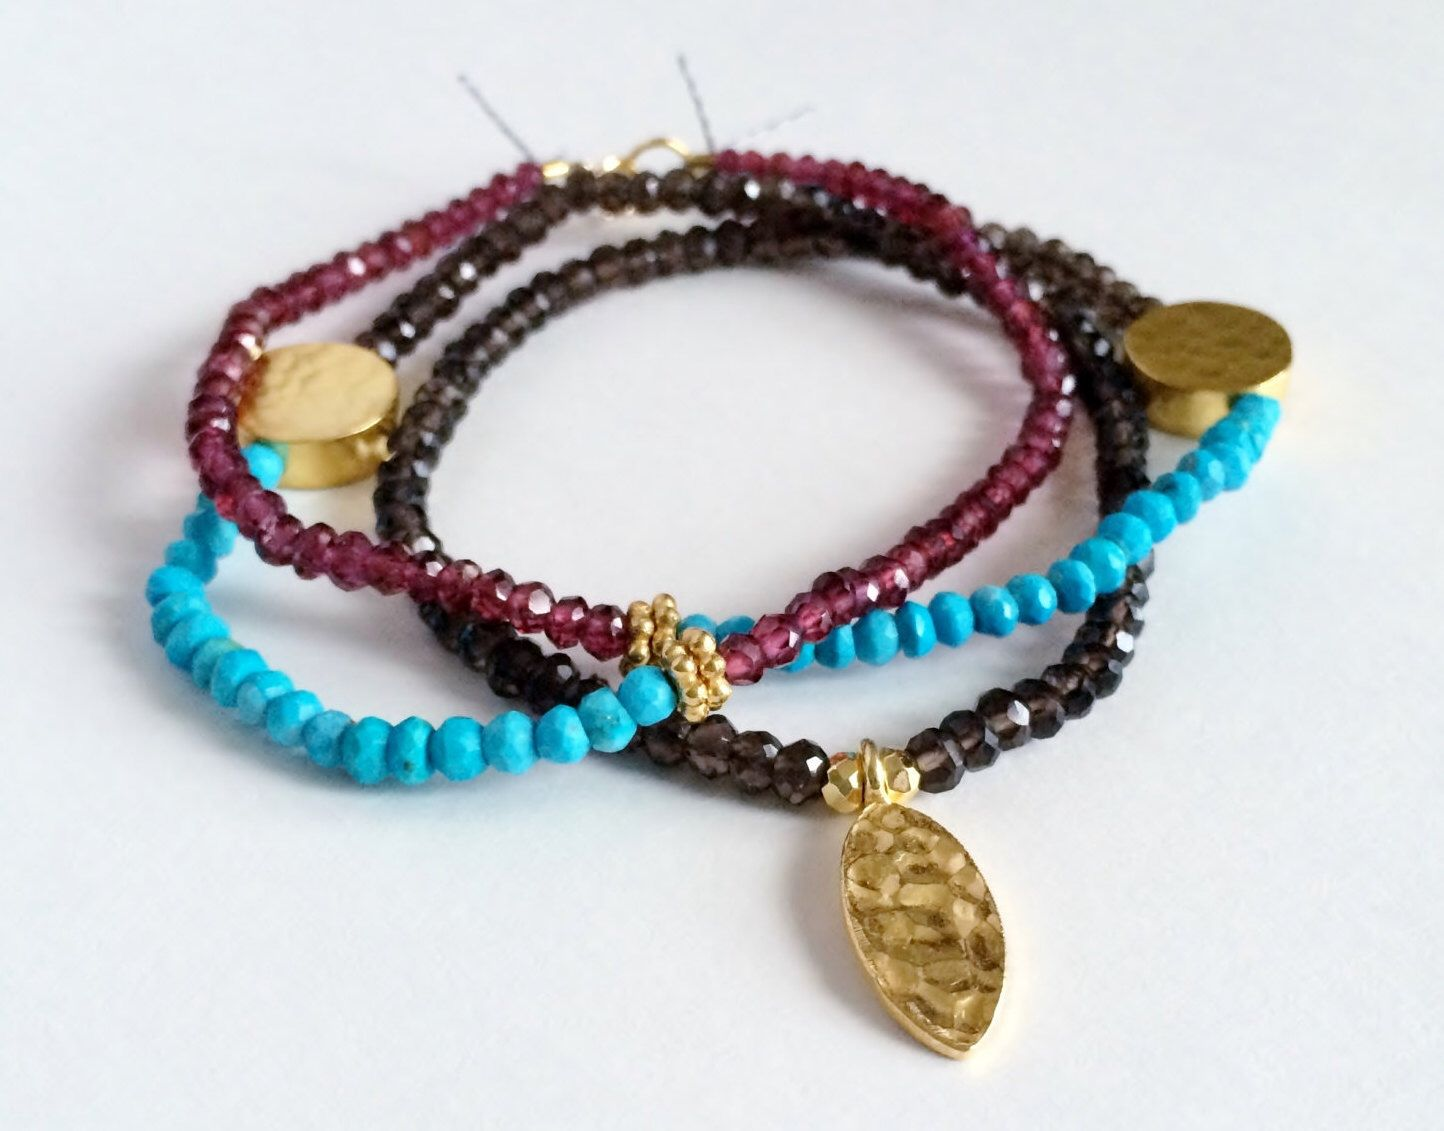 A personal favorite from my Etsy shop https://www.etsy.com/listing/224459843/bohemian-style-multi-gemstone-bracelet